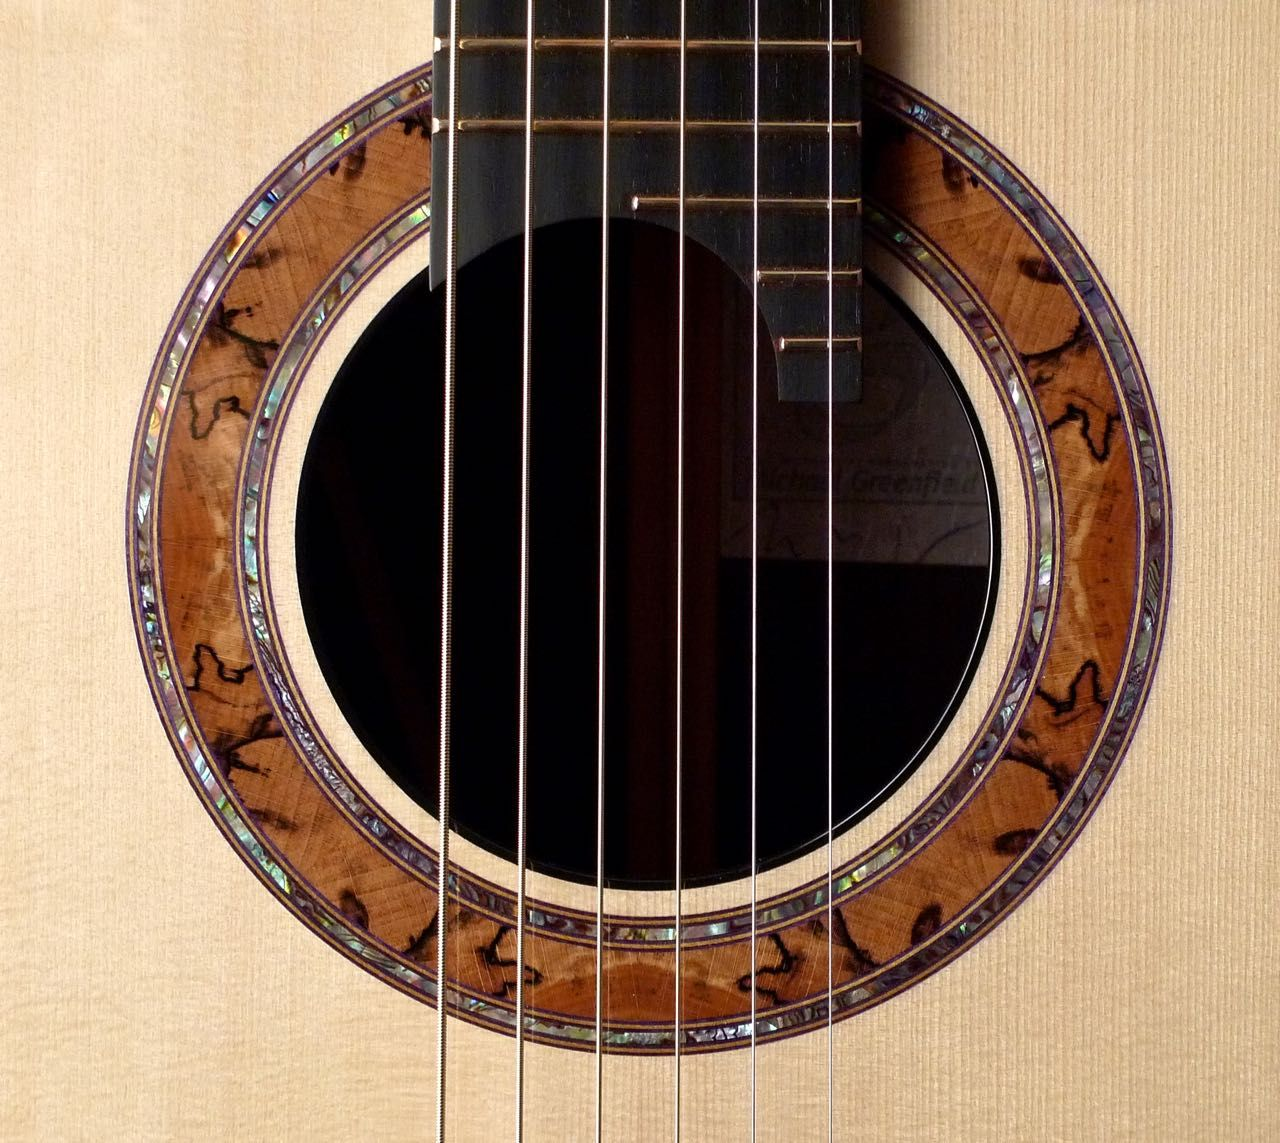 2015 Greenfield G2 Guitar Inlay Acoustic Guitar Acoustic Guitar Strings